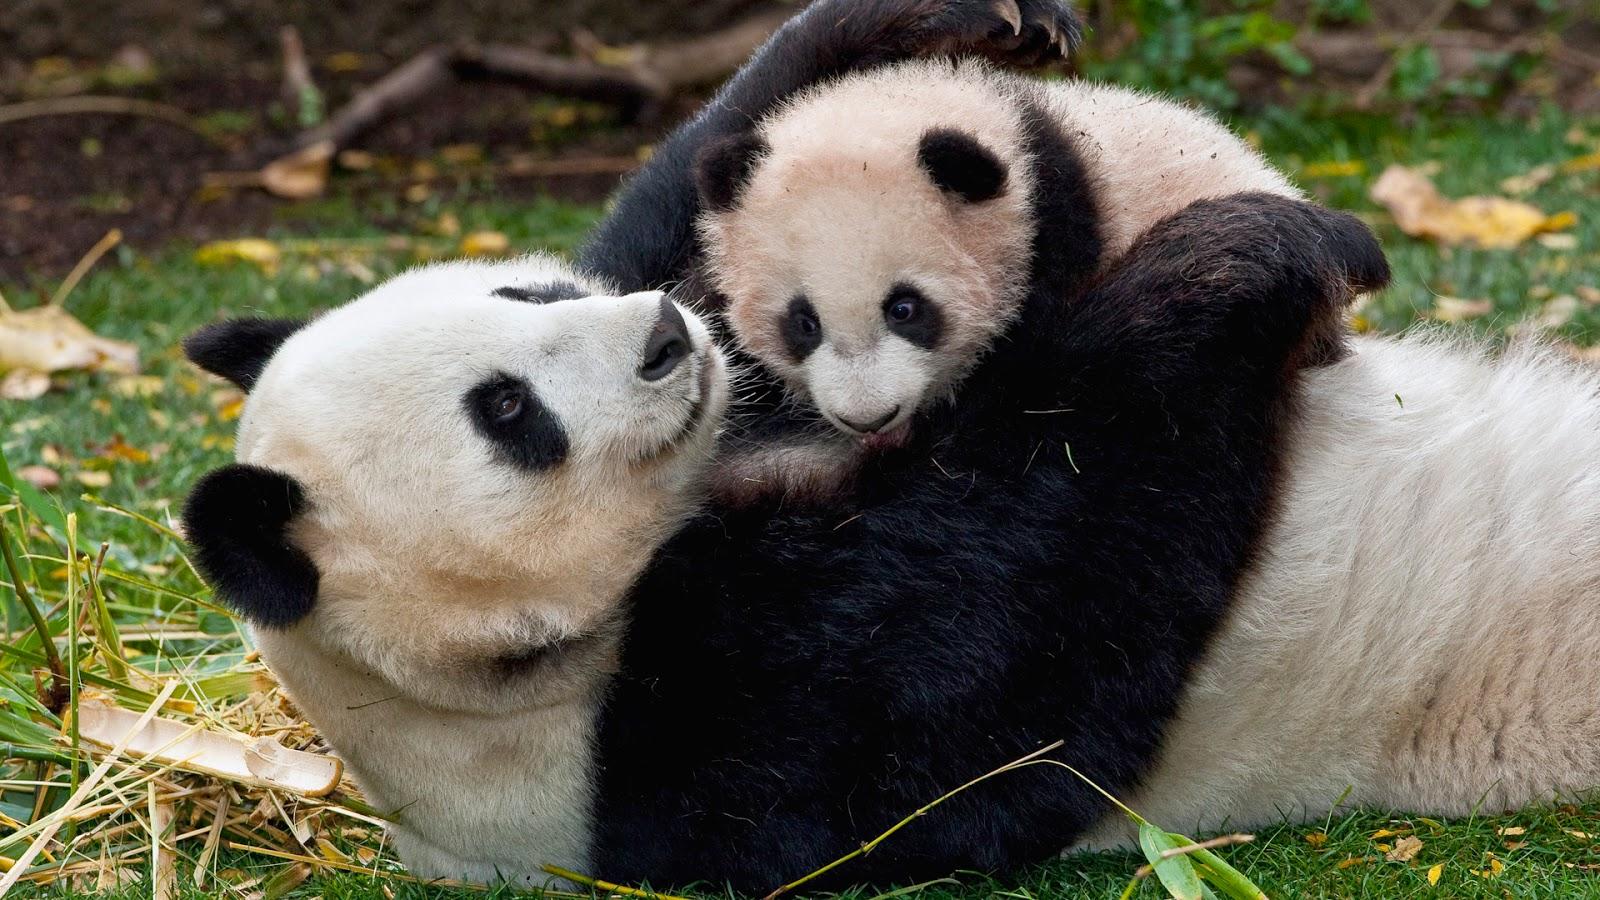 Panda mom puts to sleep son